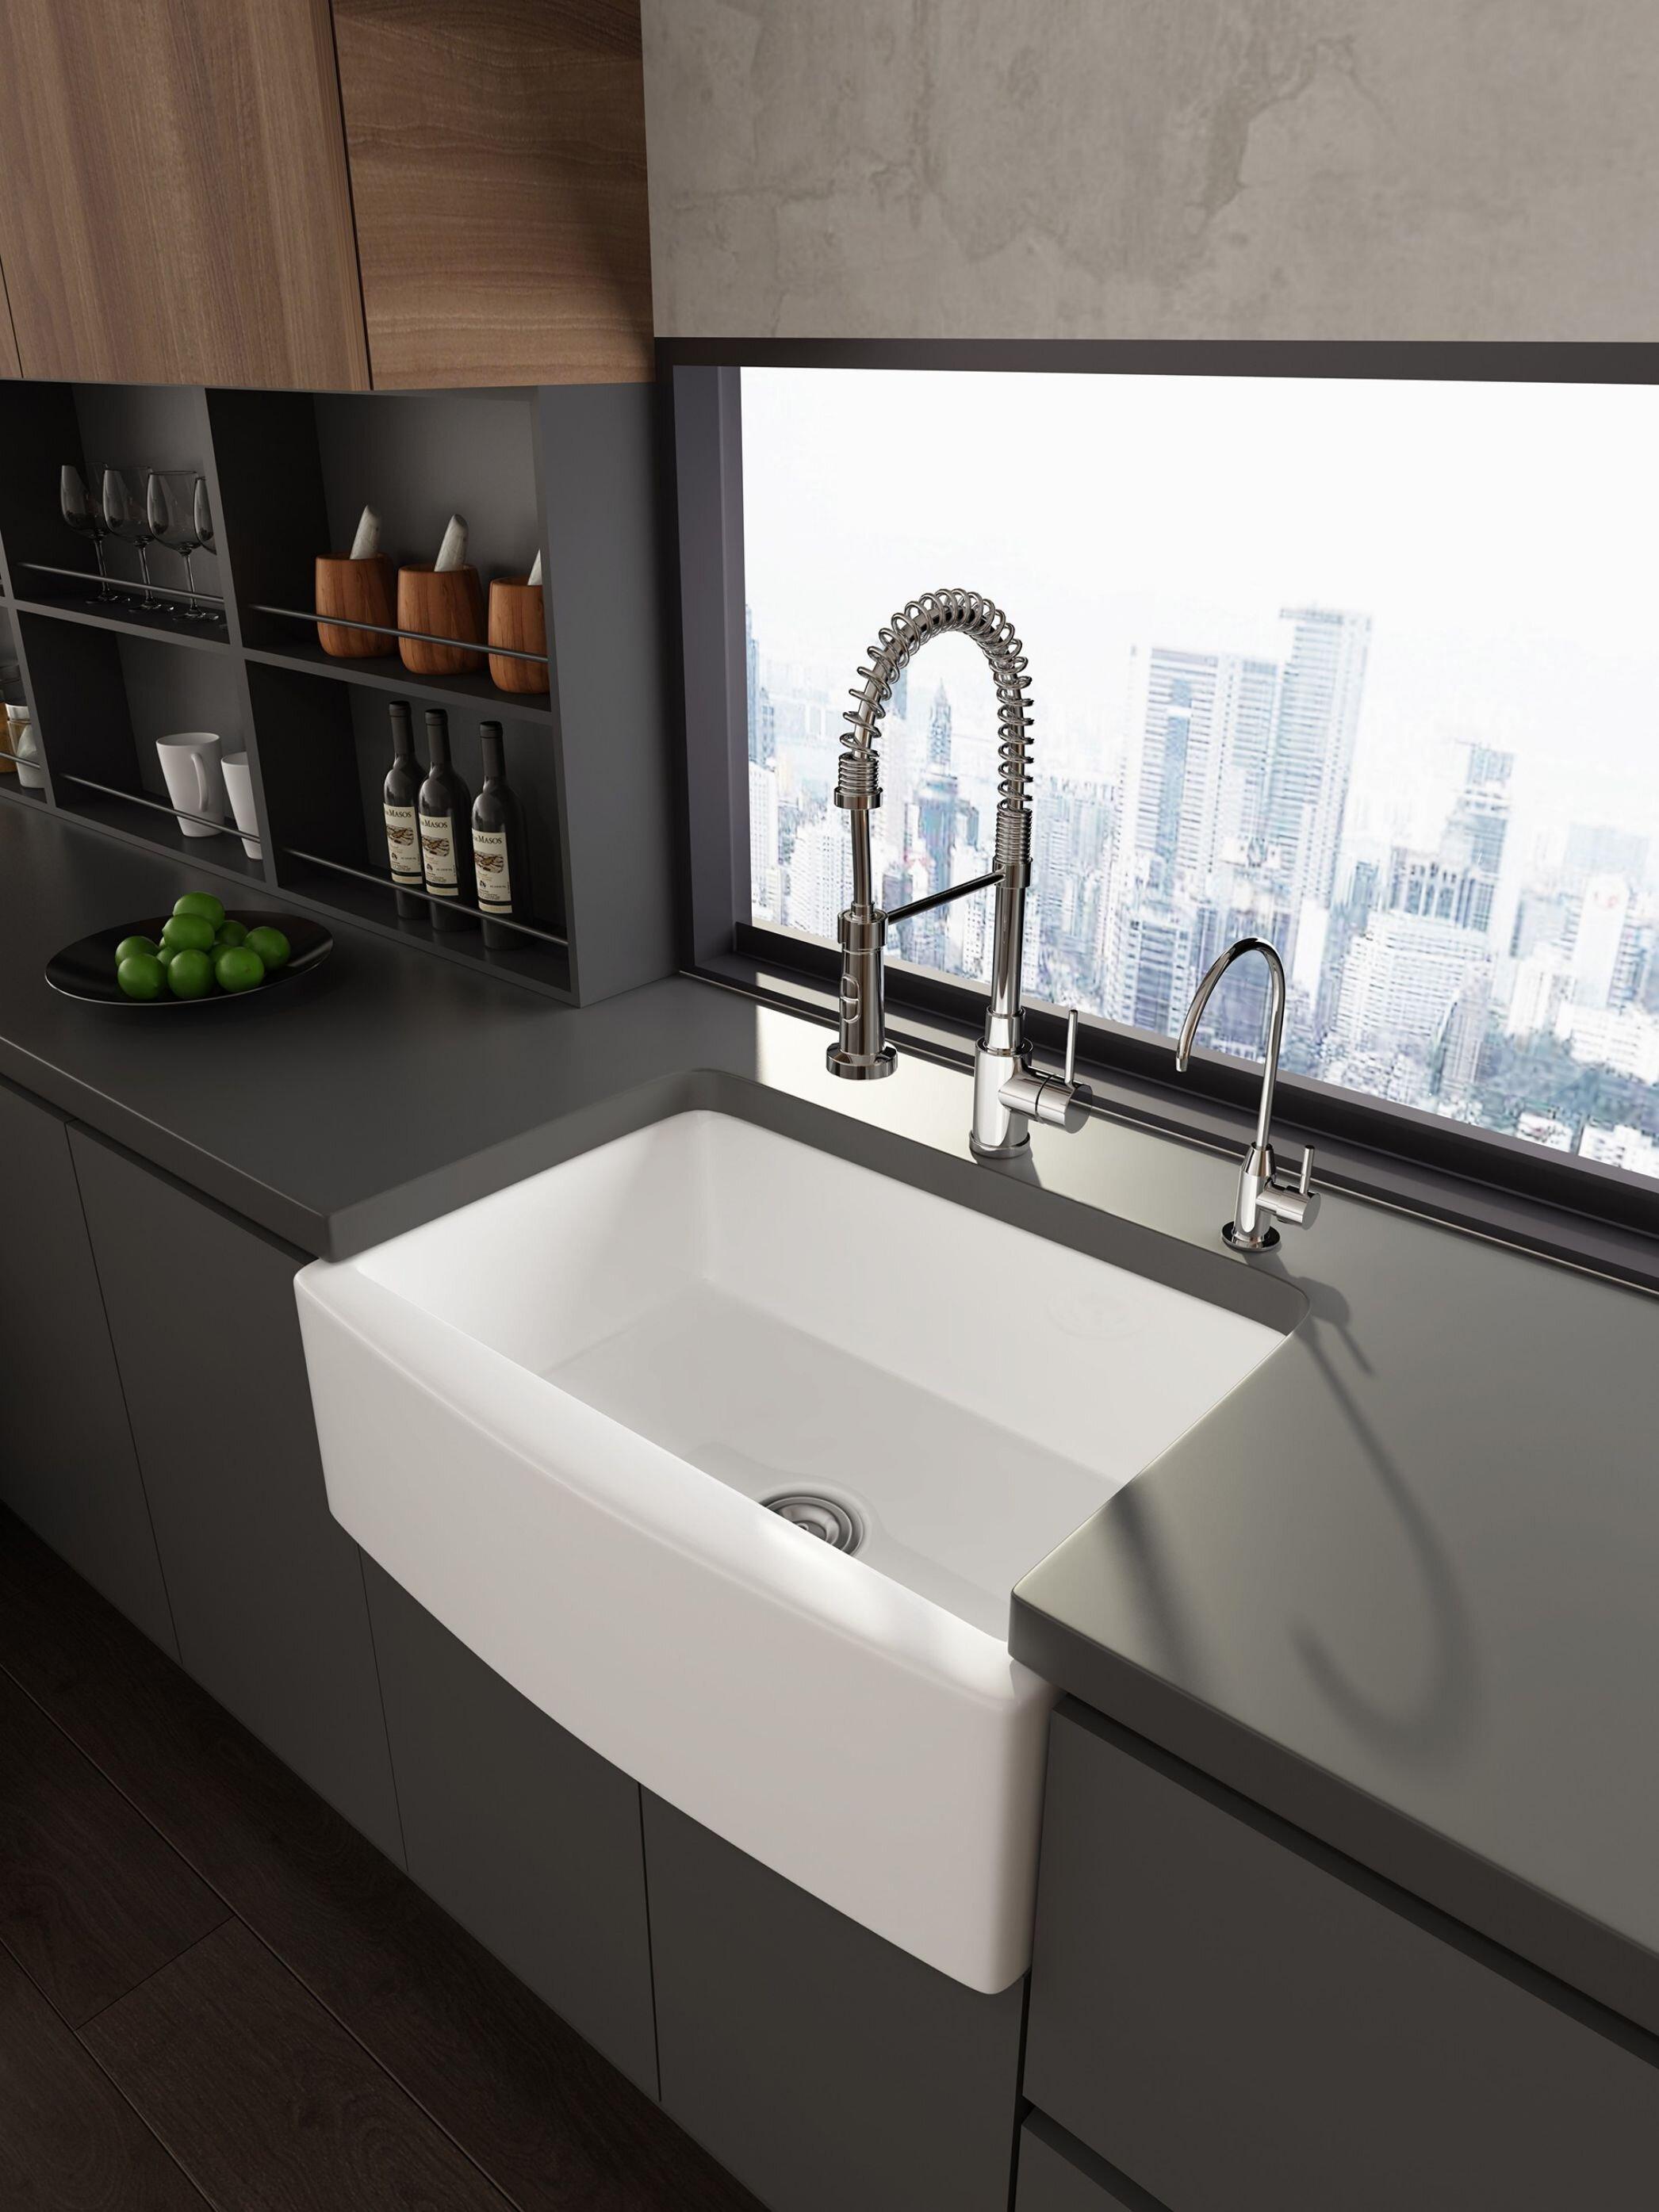 J E Home Ceramic 29 75 L X 20 5 W Farmhouse Kitchen Sink Rectangular White Vessel Sink Bathroom Sink With Grid And Strainer Wayfair